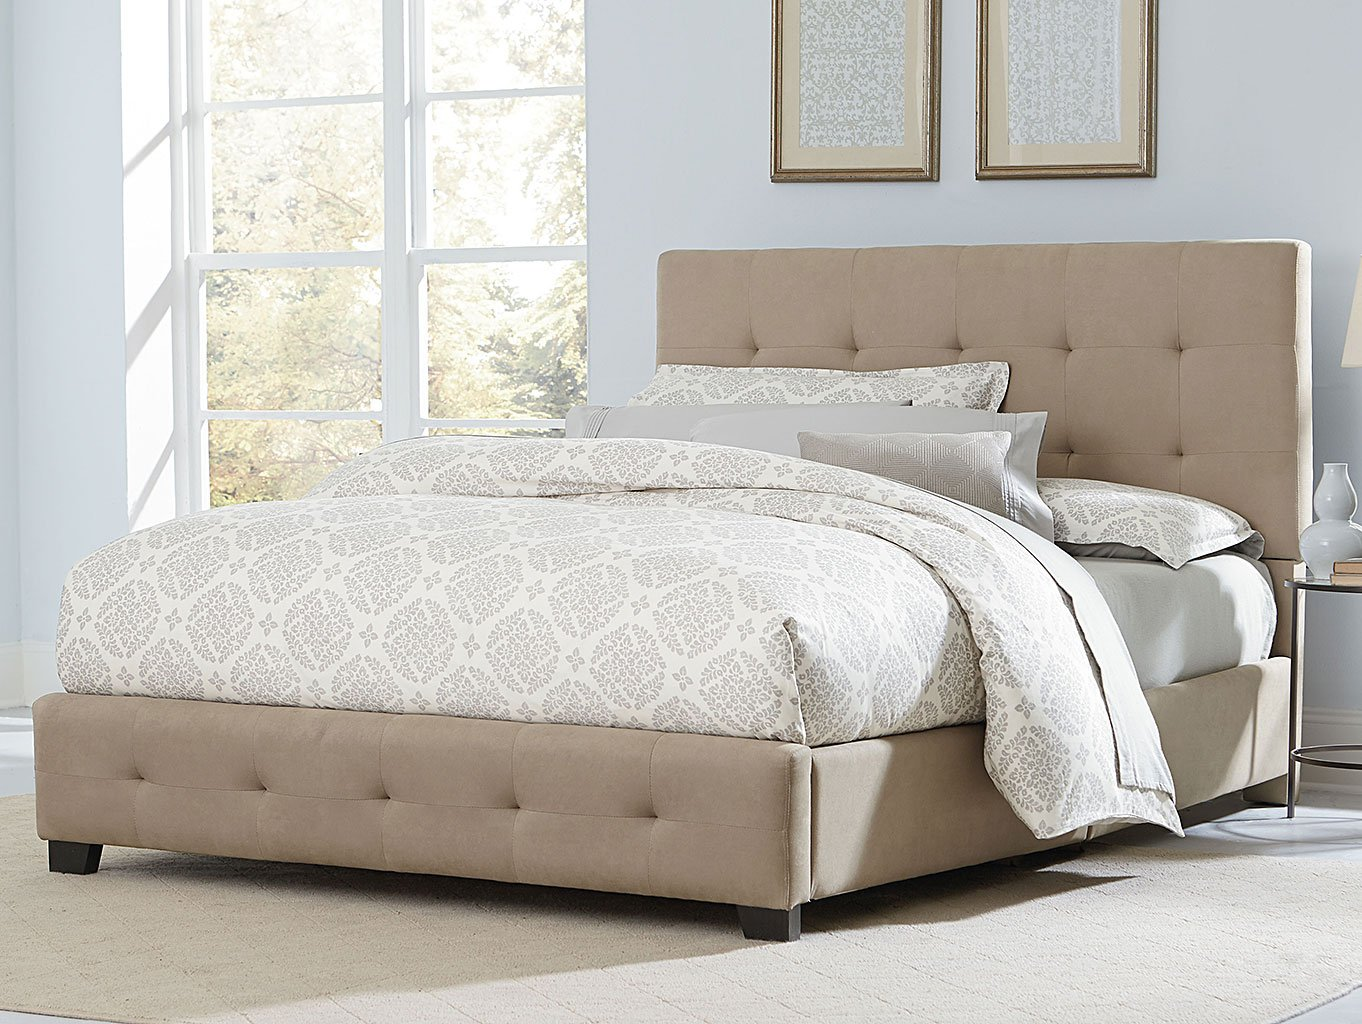 Madison Square Upholstered Bed Sand Standard Furniture